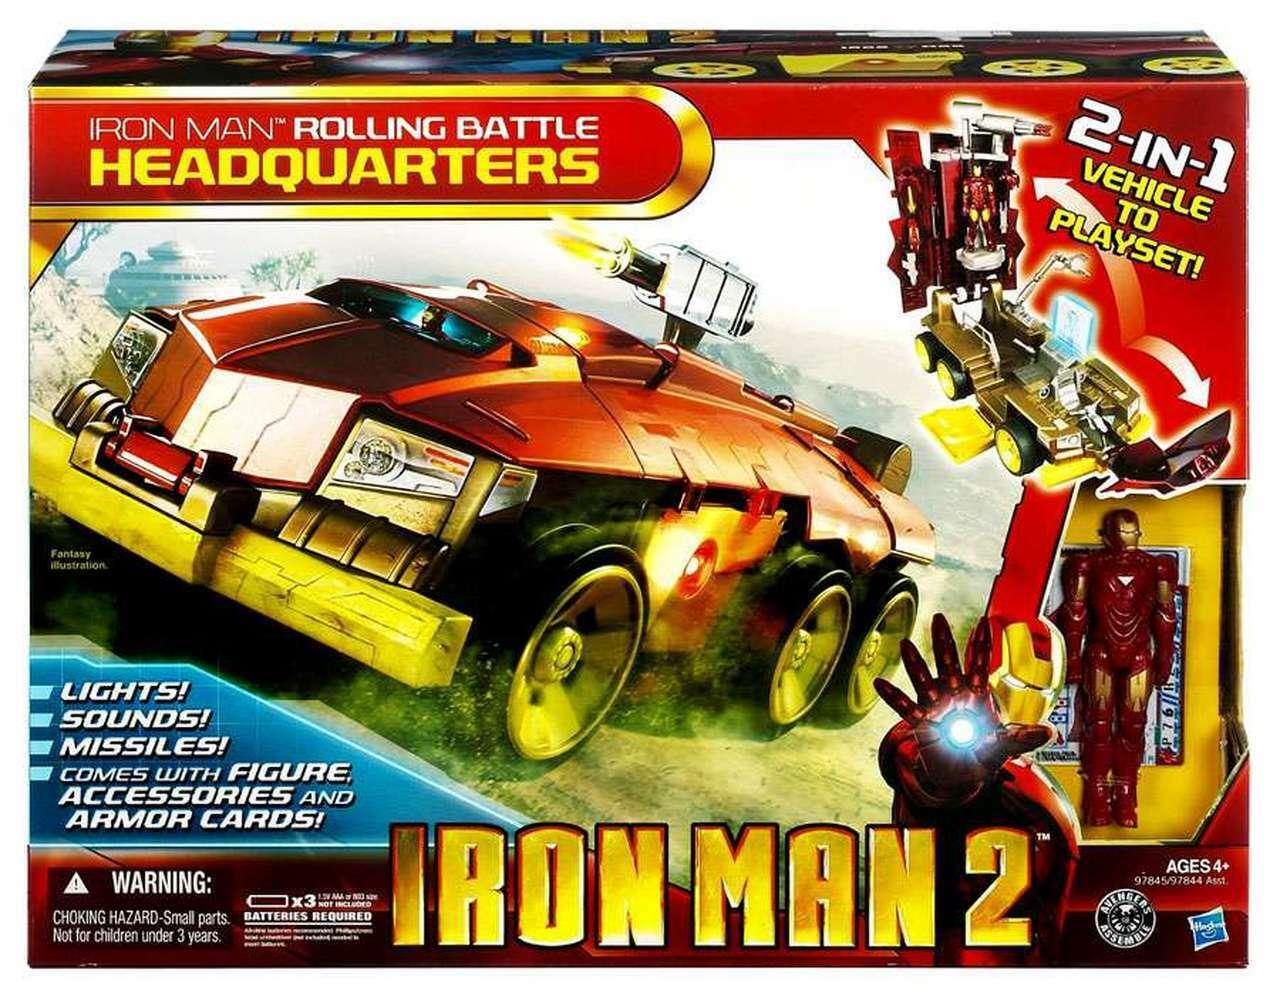 Iron Man 2 Rolling Battle Headqukonsters  2-in-1 fordon